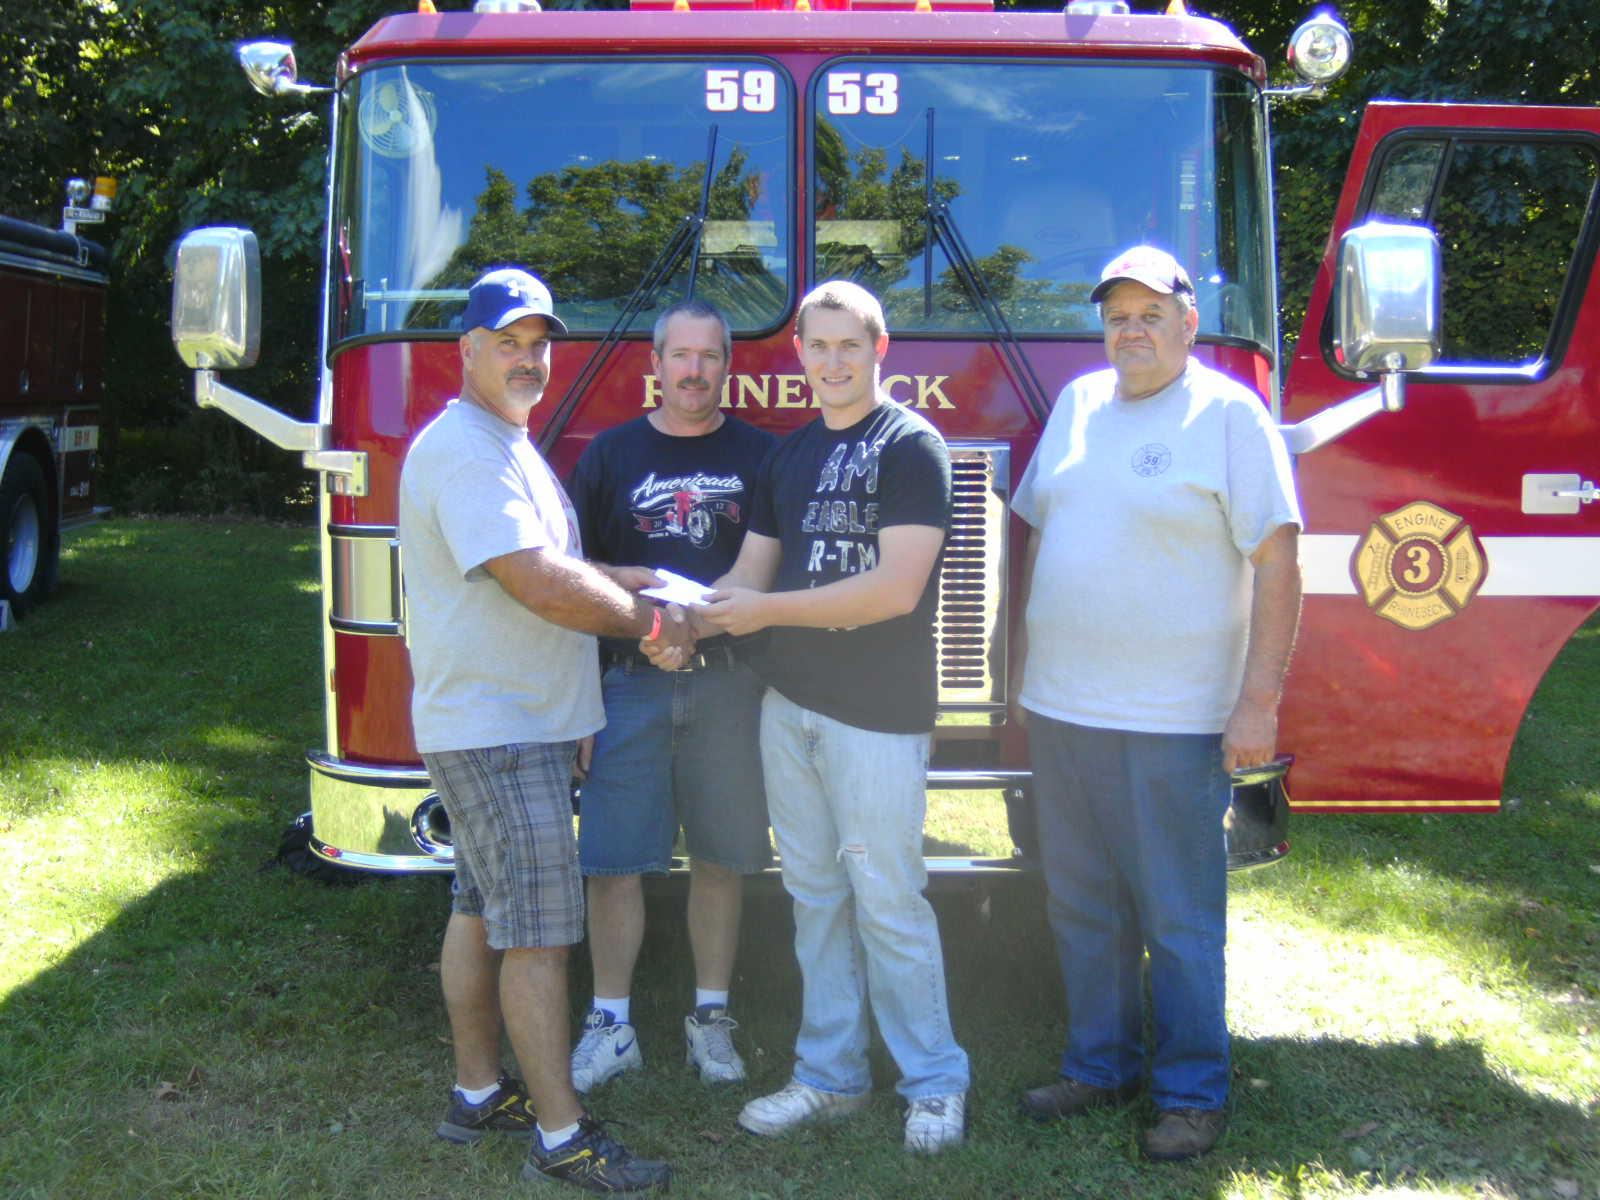 Caption: (L to R): Treasurer John Imperato, Chief Rick Dorrer, Devon Dorrer,  President Bill Stroka